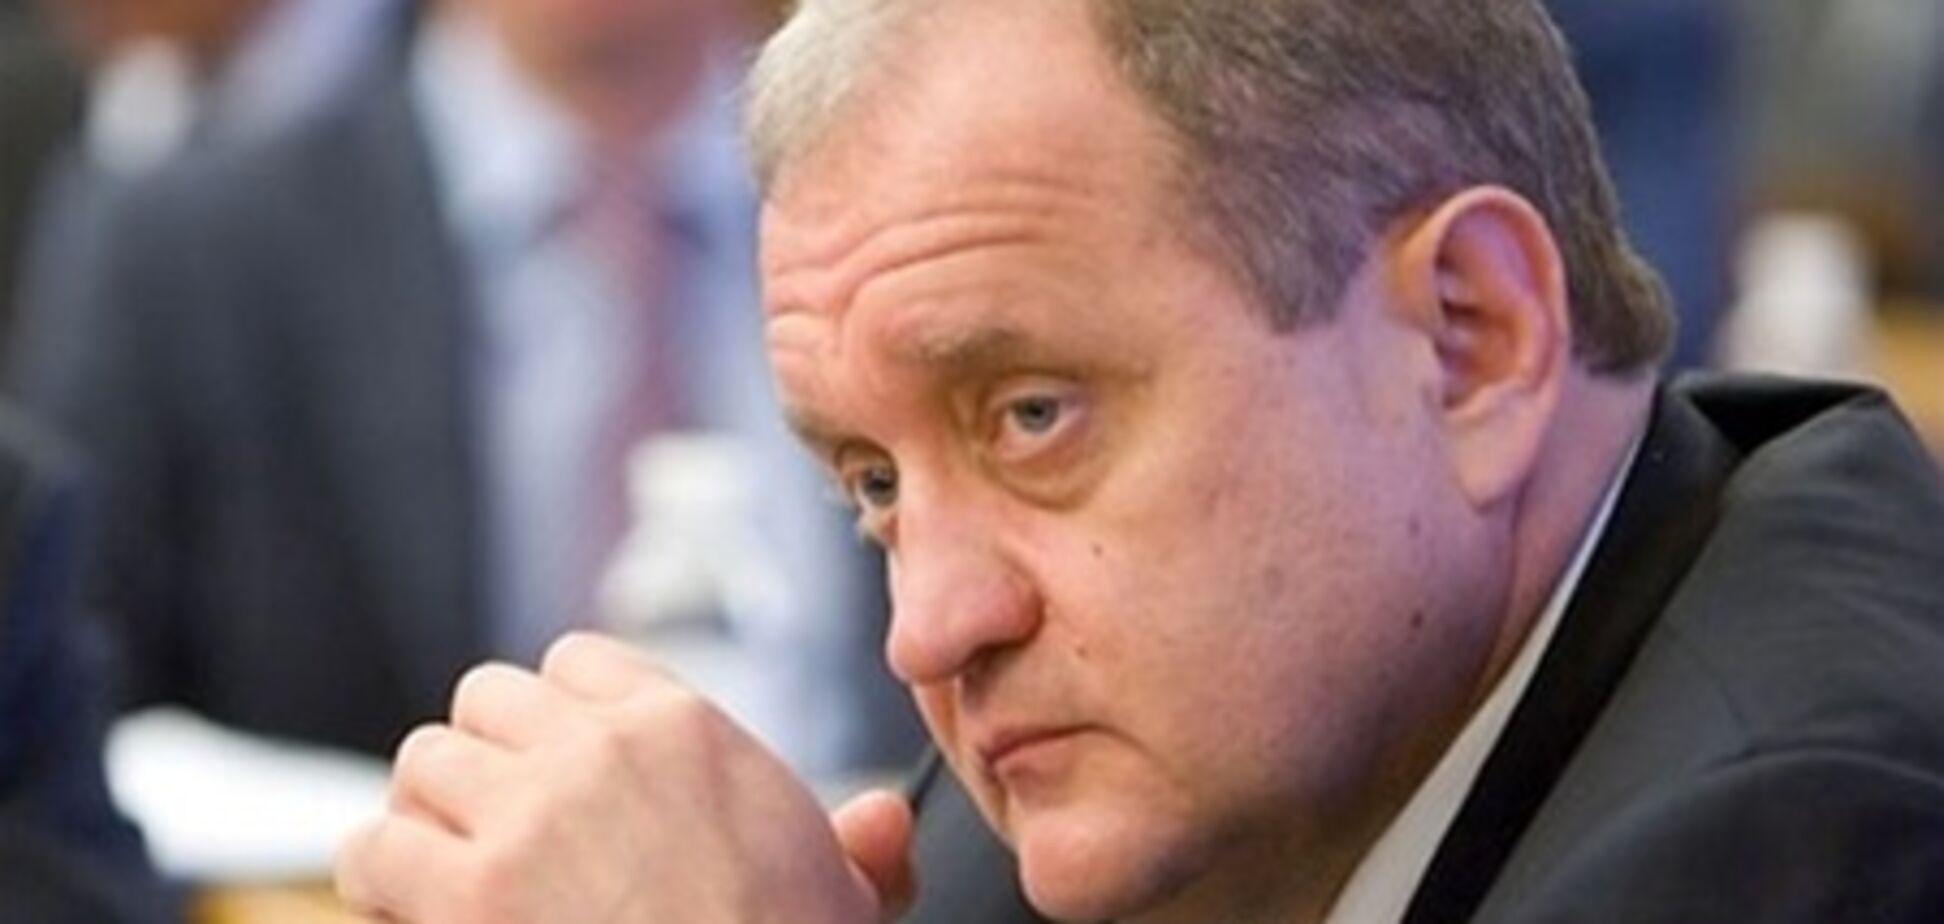 Кравченко можуть прибрати з дошки пошани глав МВС через справу Гонгадзе